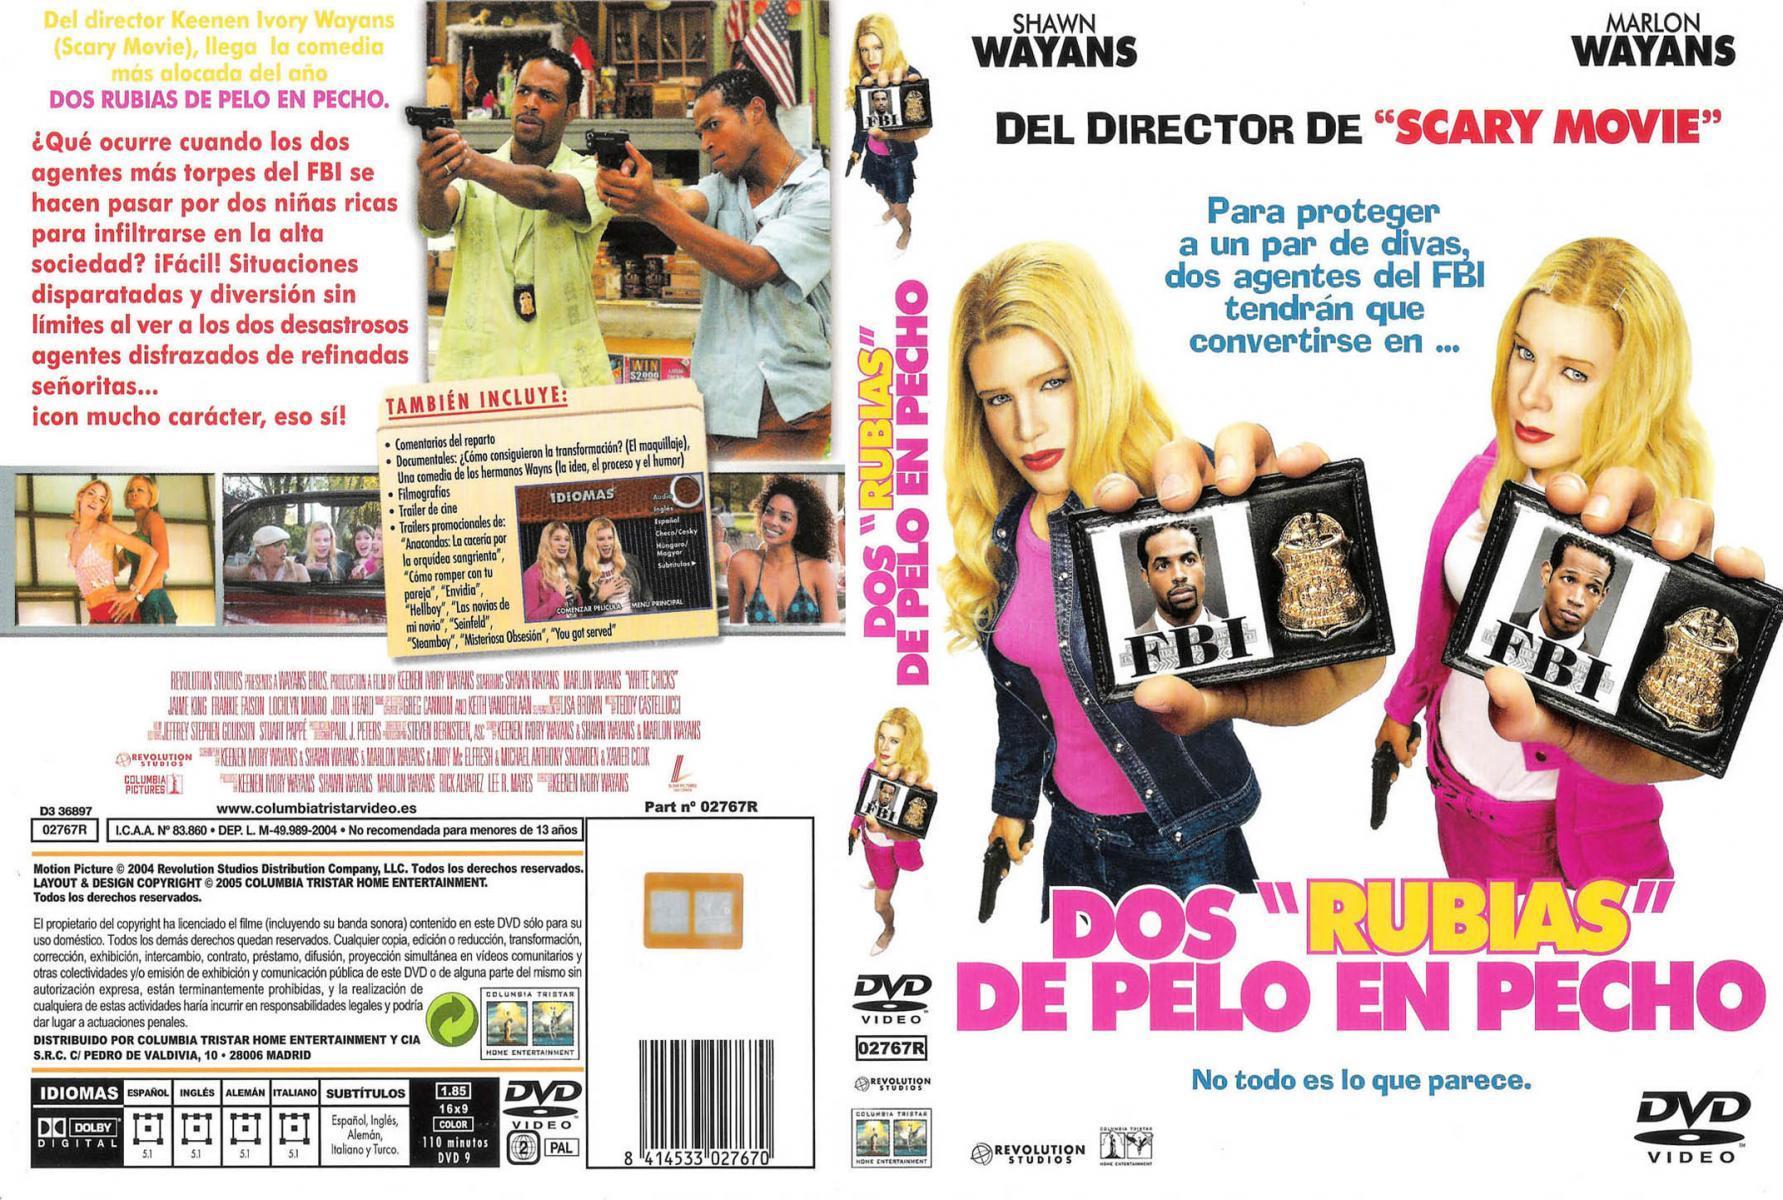 Dos Rubias De Pelo En Pecho 2004 Filmaffinity